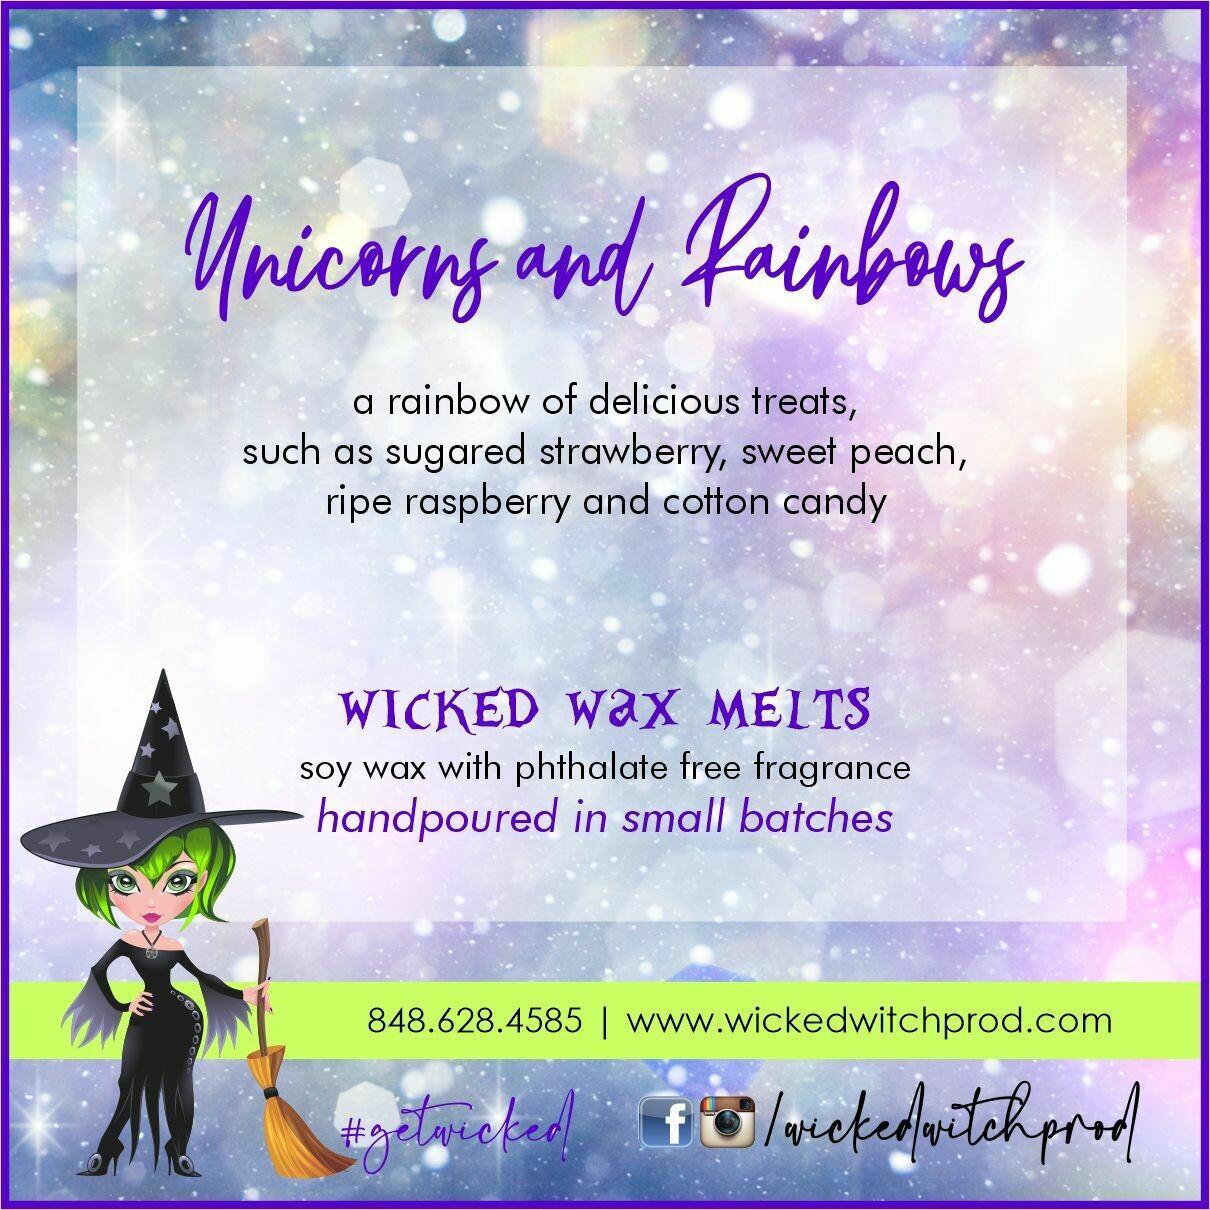 Unicorns & Rainbows Wicked Wax Melts